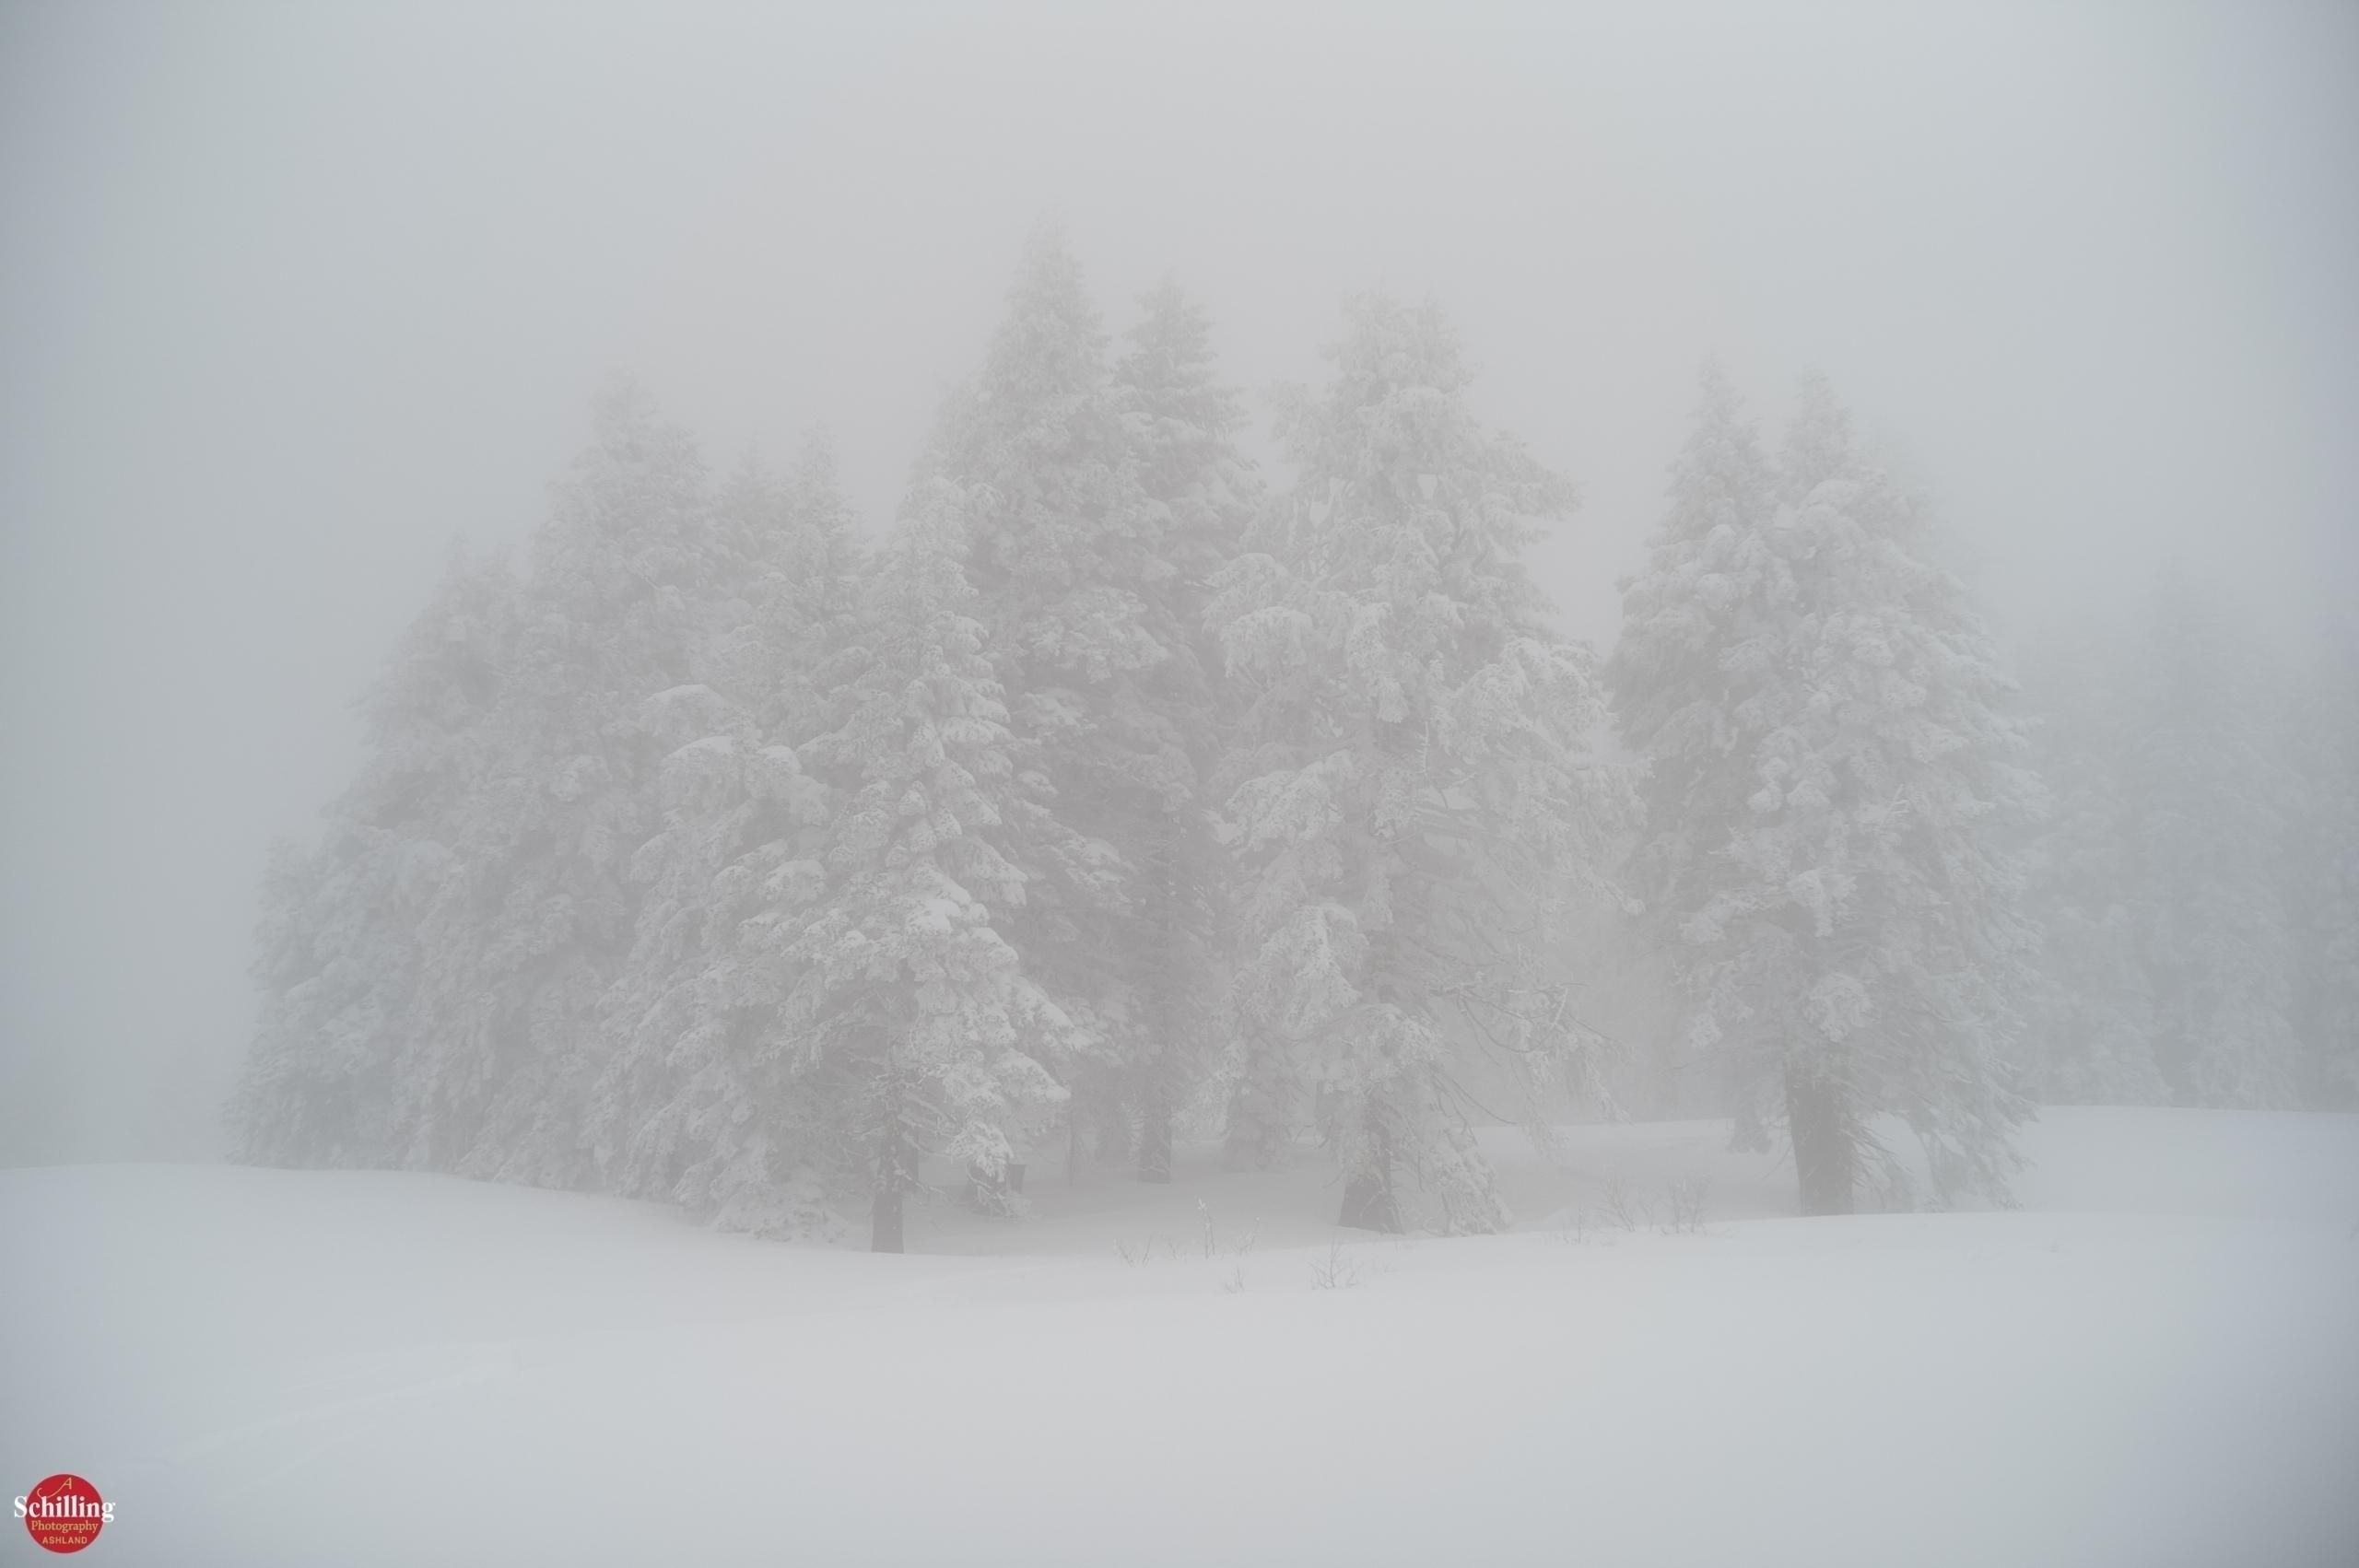 Atmospheric Impression; Snow Fo - augustschilling | ello